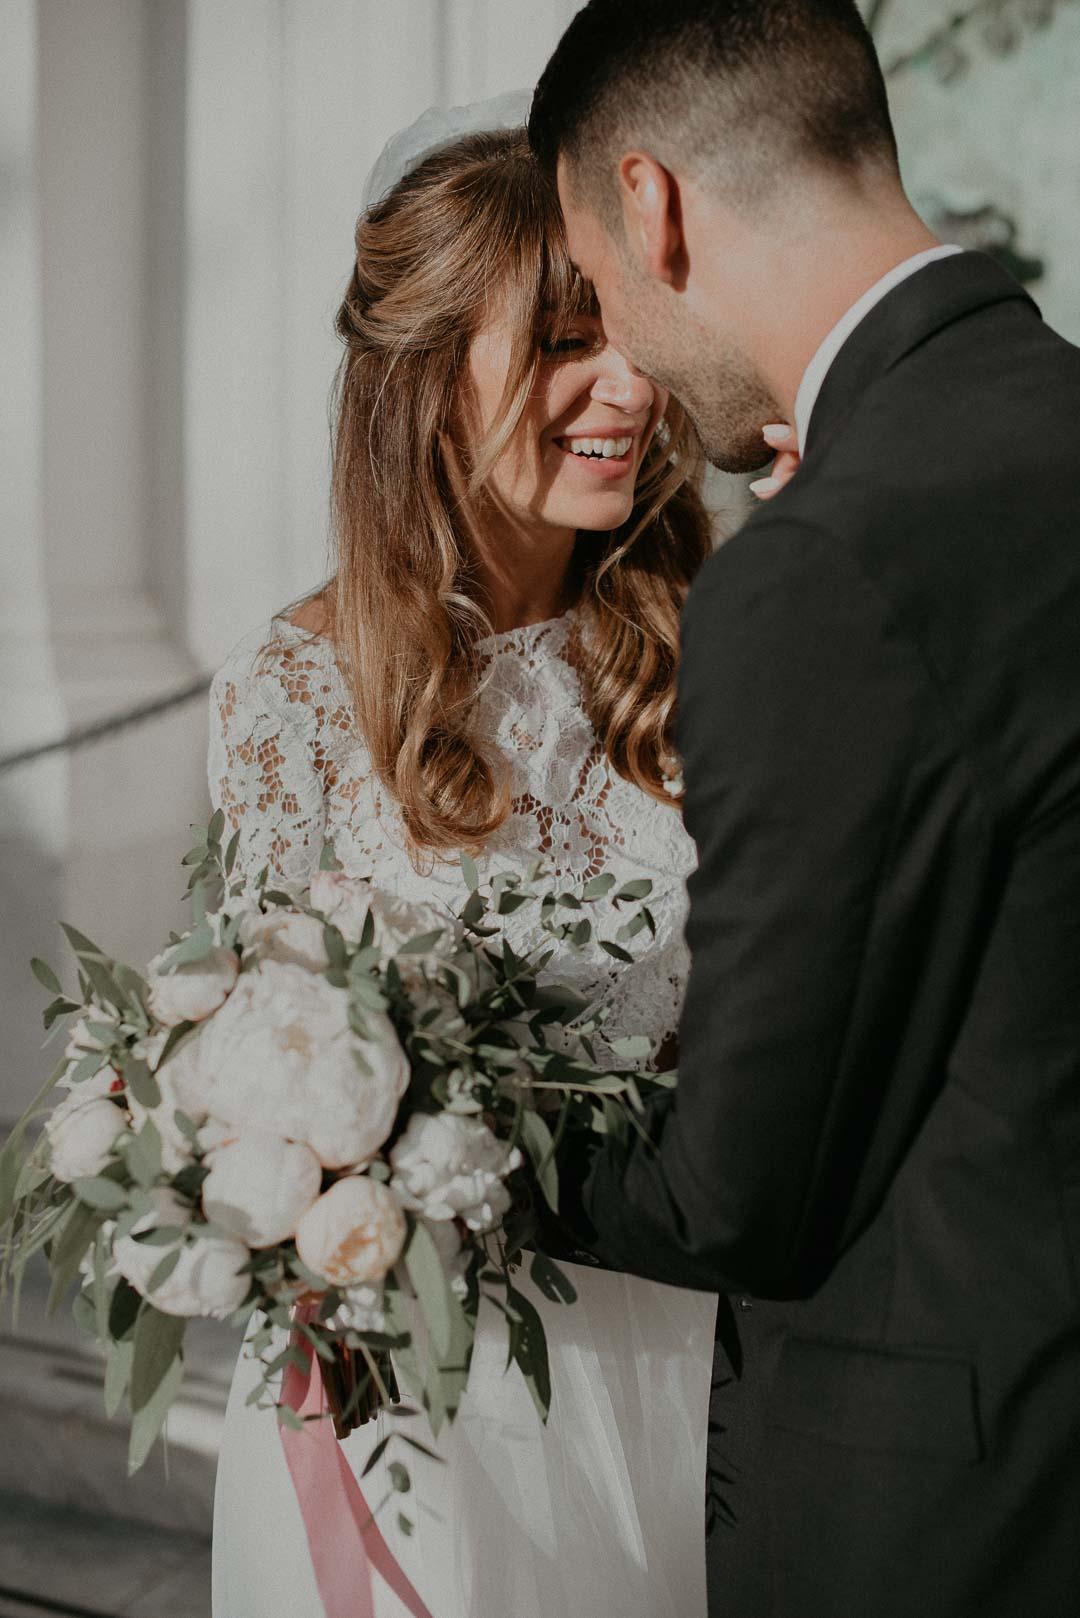 wedding-photographer-destination-fineart-bespoke-reportage-napoli-nabilah-vivianeizzo-spazio46-78